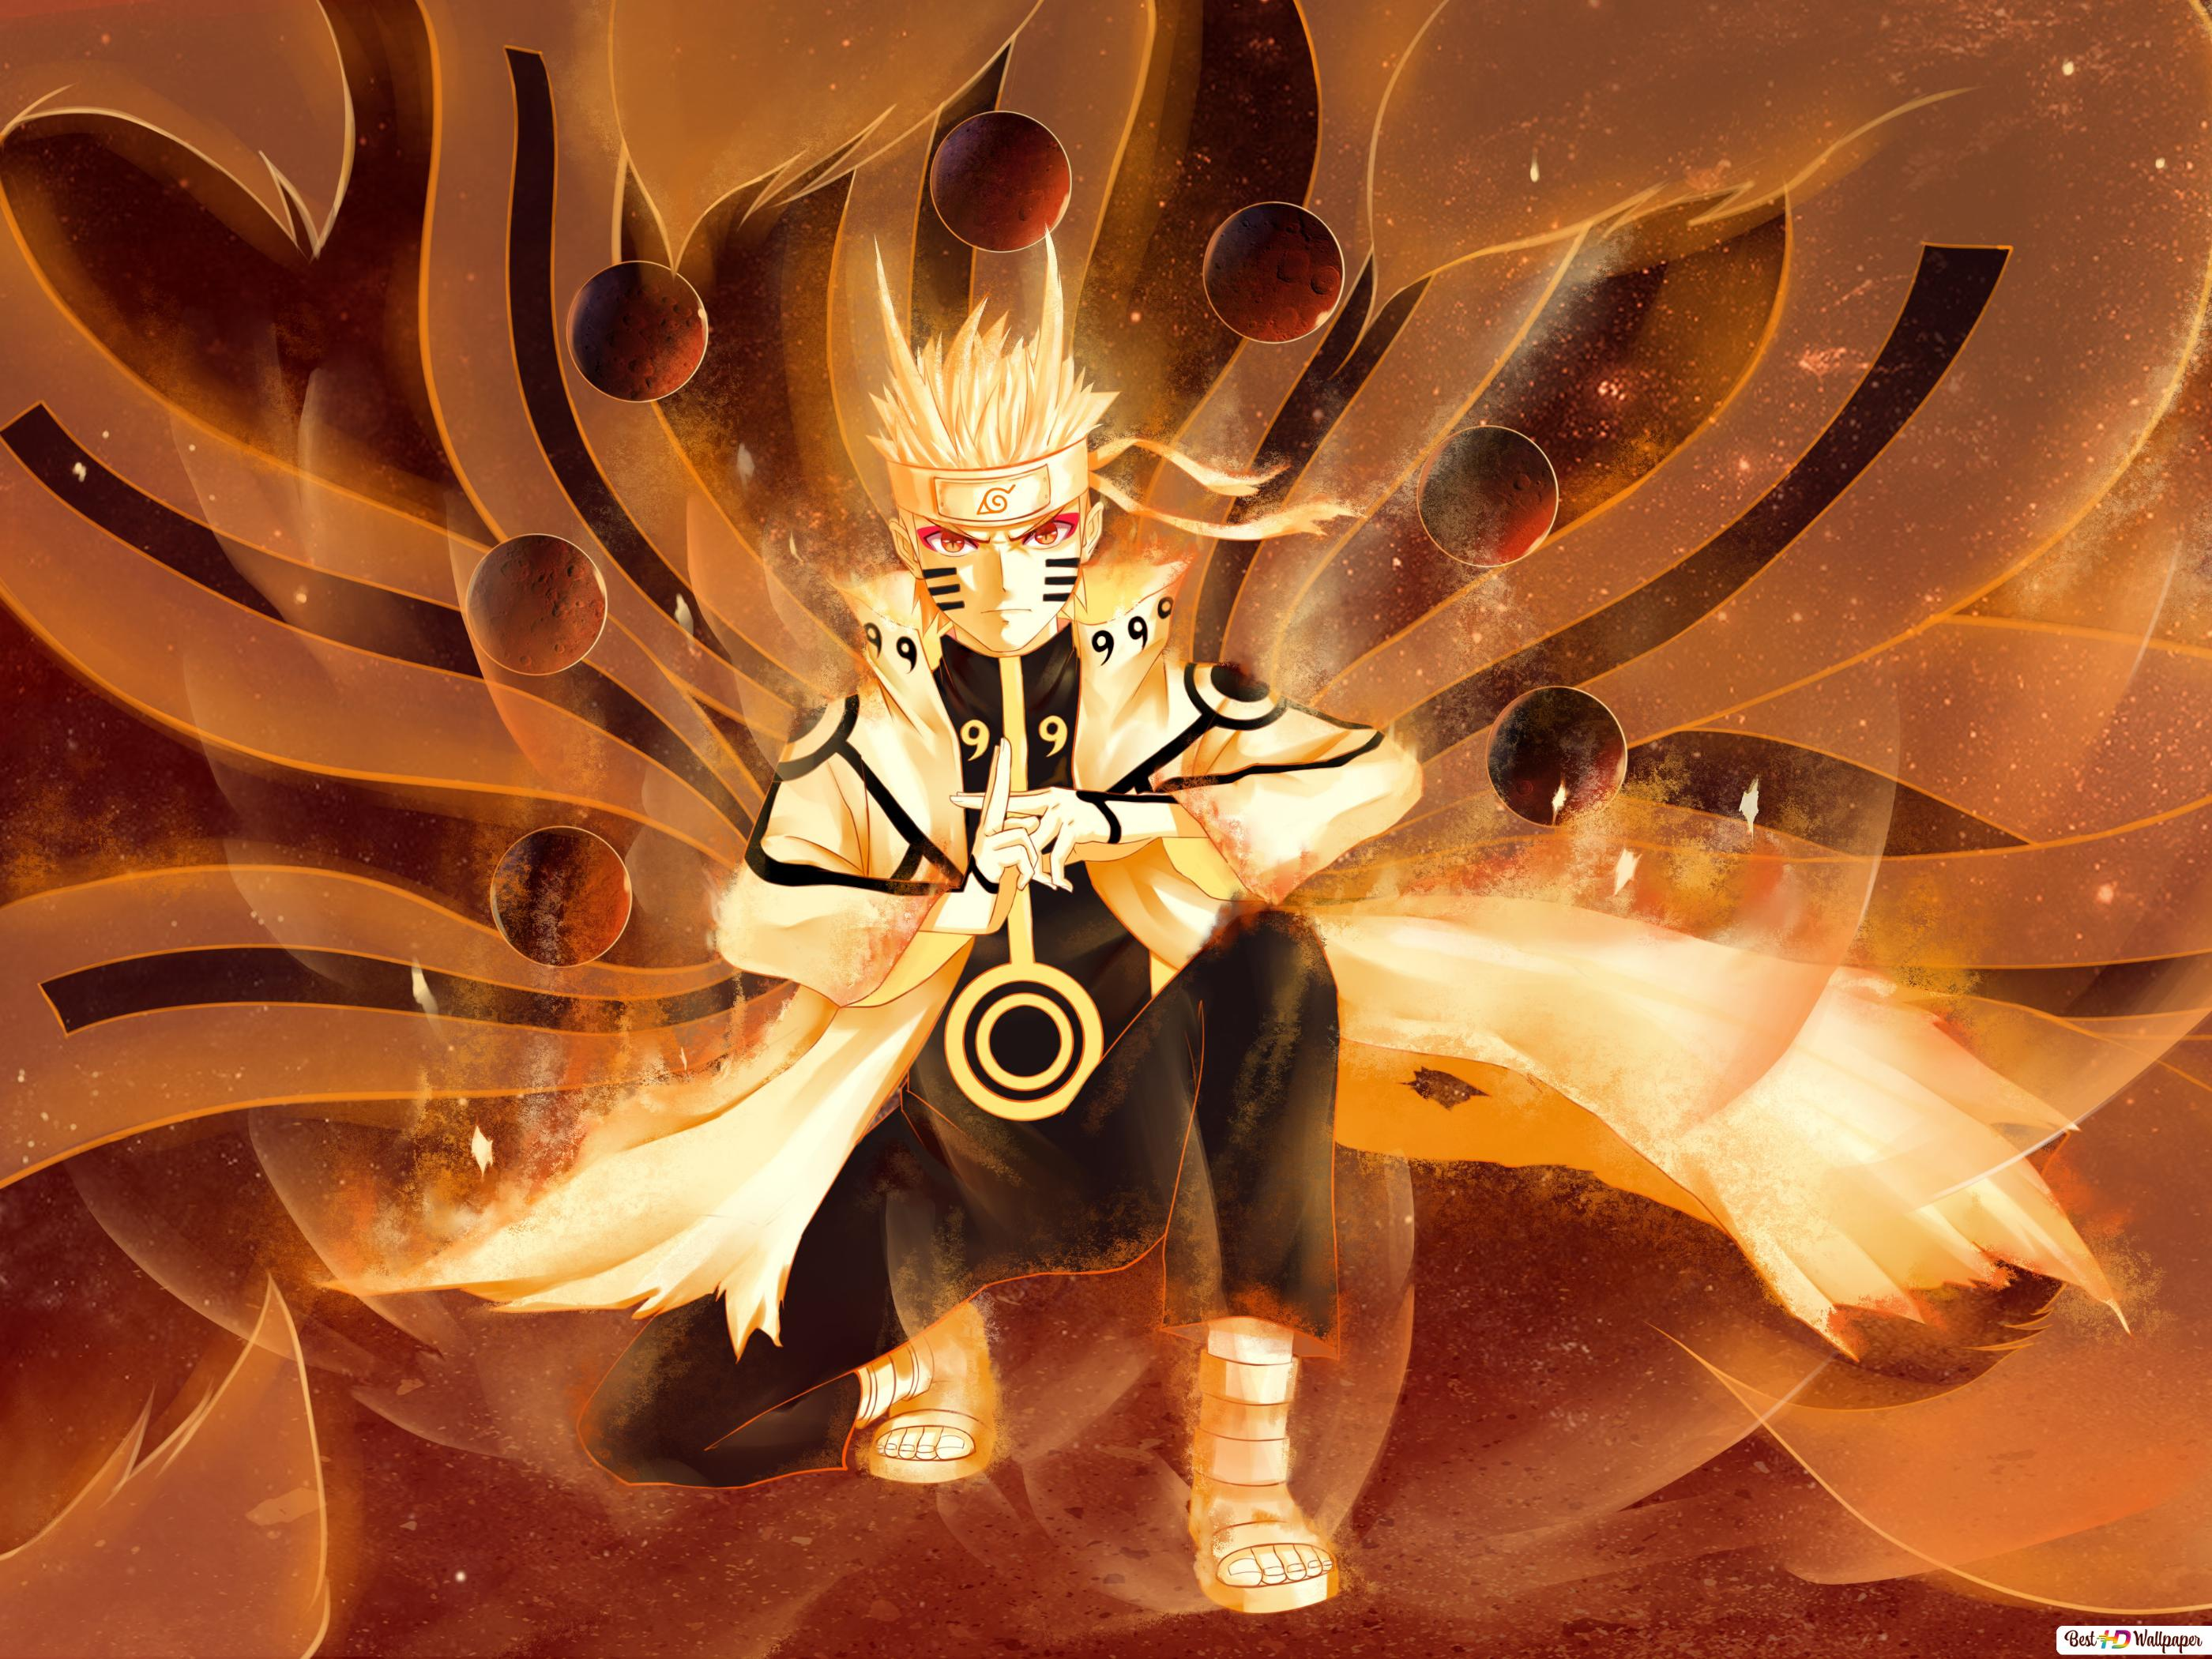 Naruto Shippuden - Naruto Uzumaki Nine Mode Tail HD fond d'écran télécharger